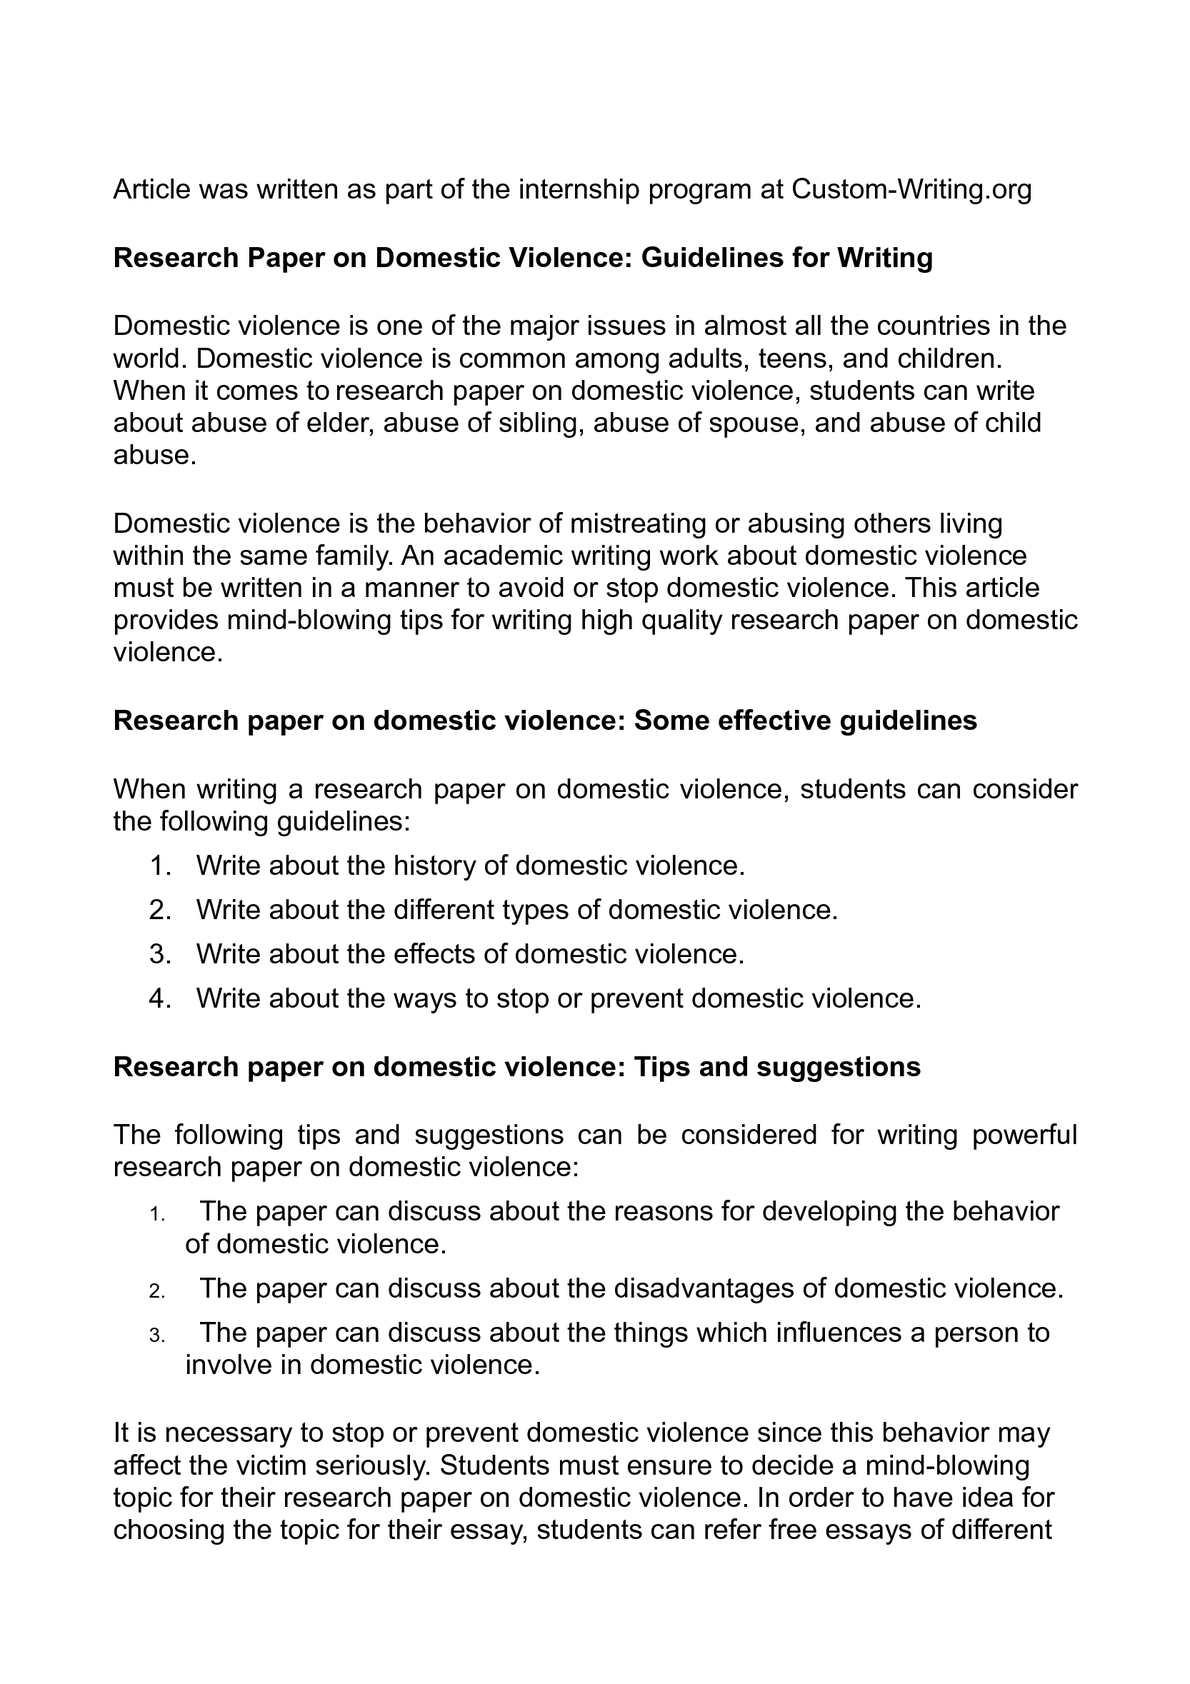 calamo   research paper on domestic violence guidelines for writing research paper on domestic violence guidelines for writing